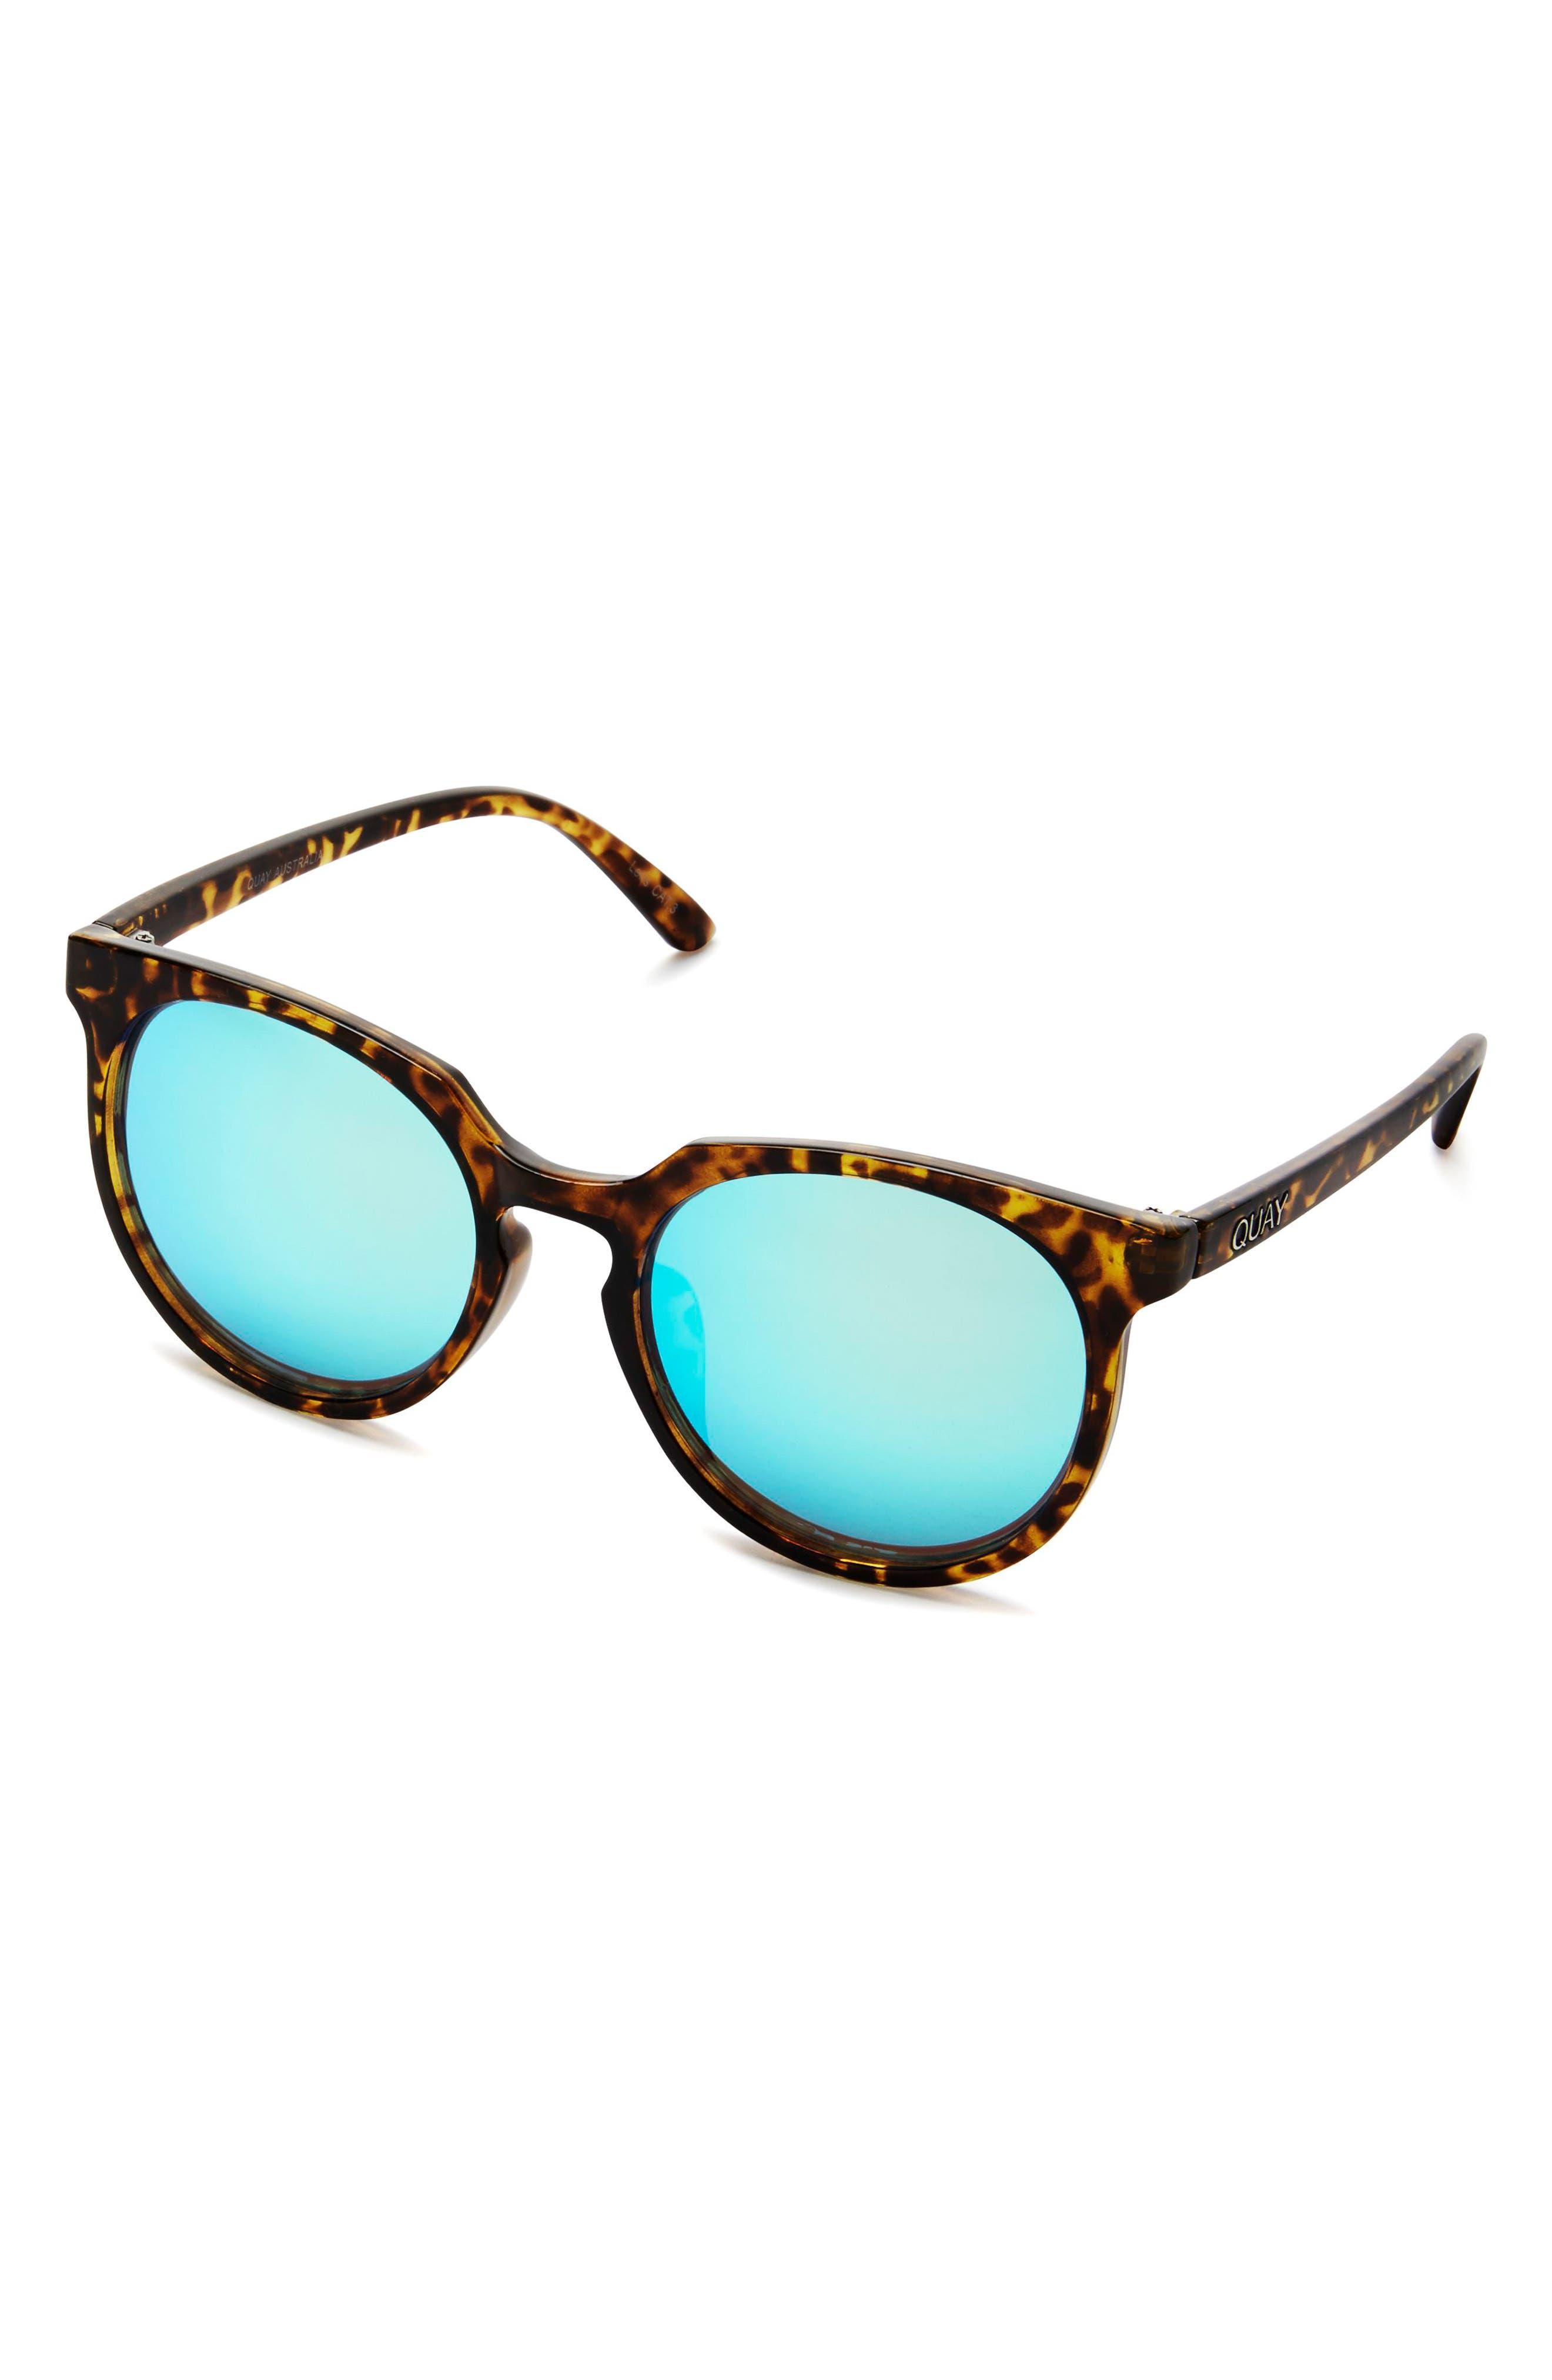 Don't Change 60mm Round Sunglasses,                             Alternate thumbnail 2, color,                             410